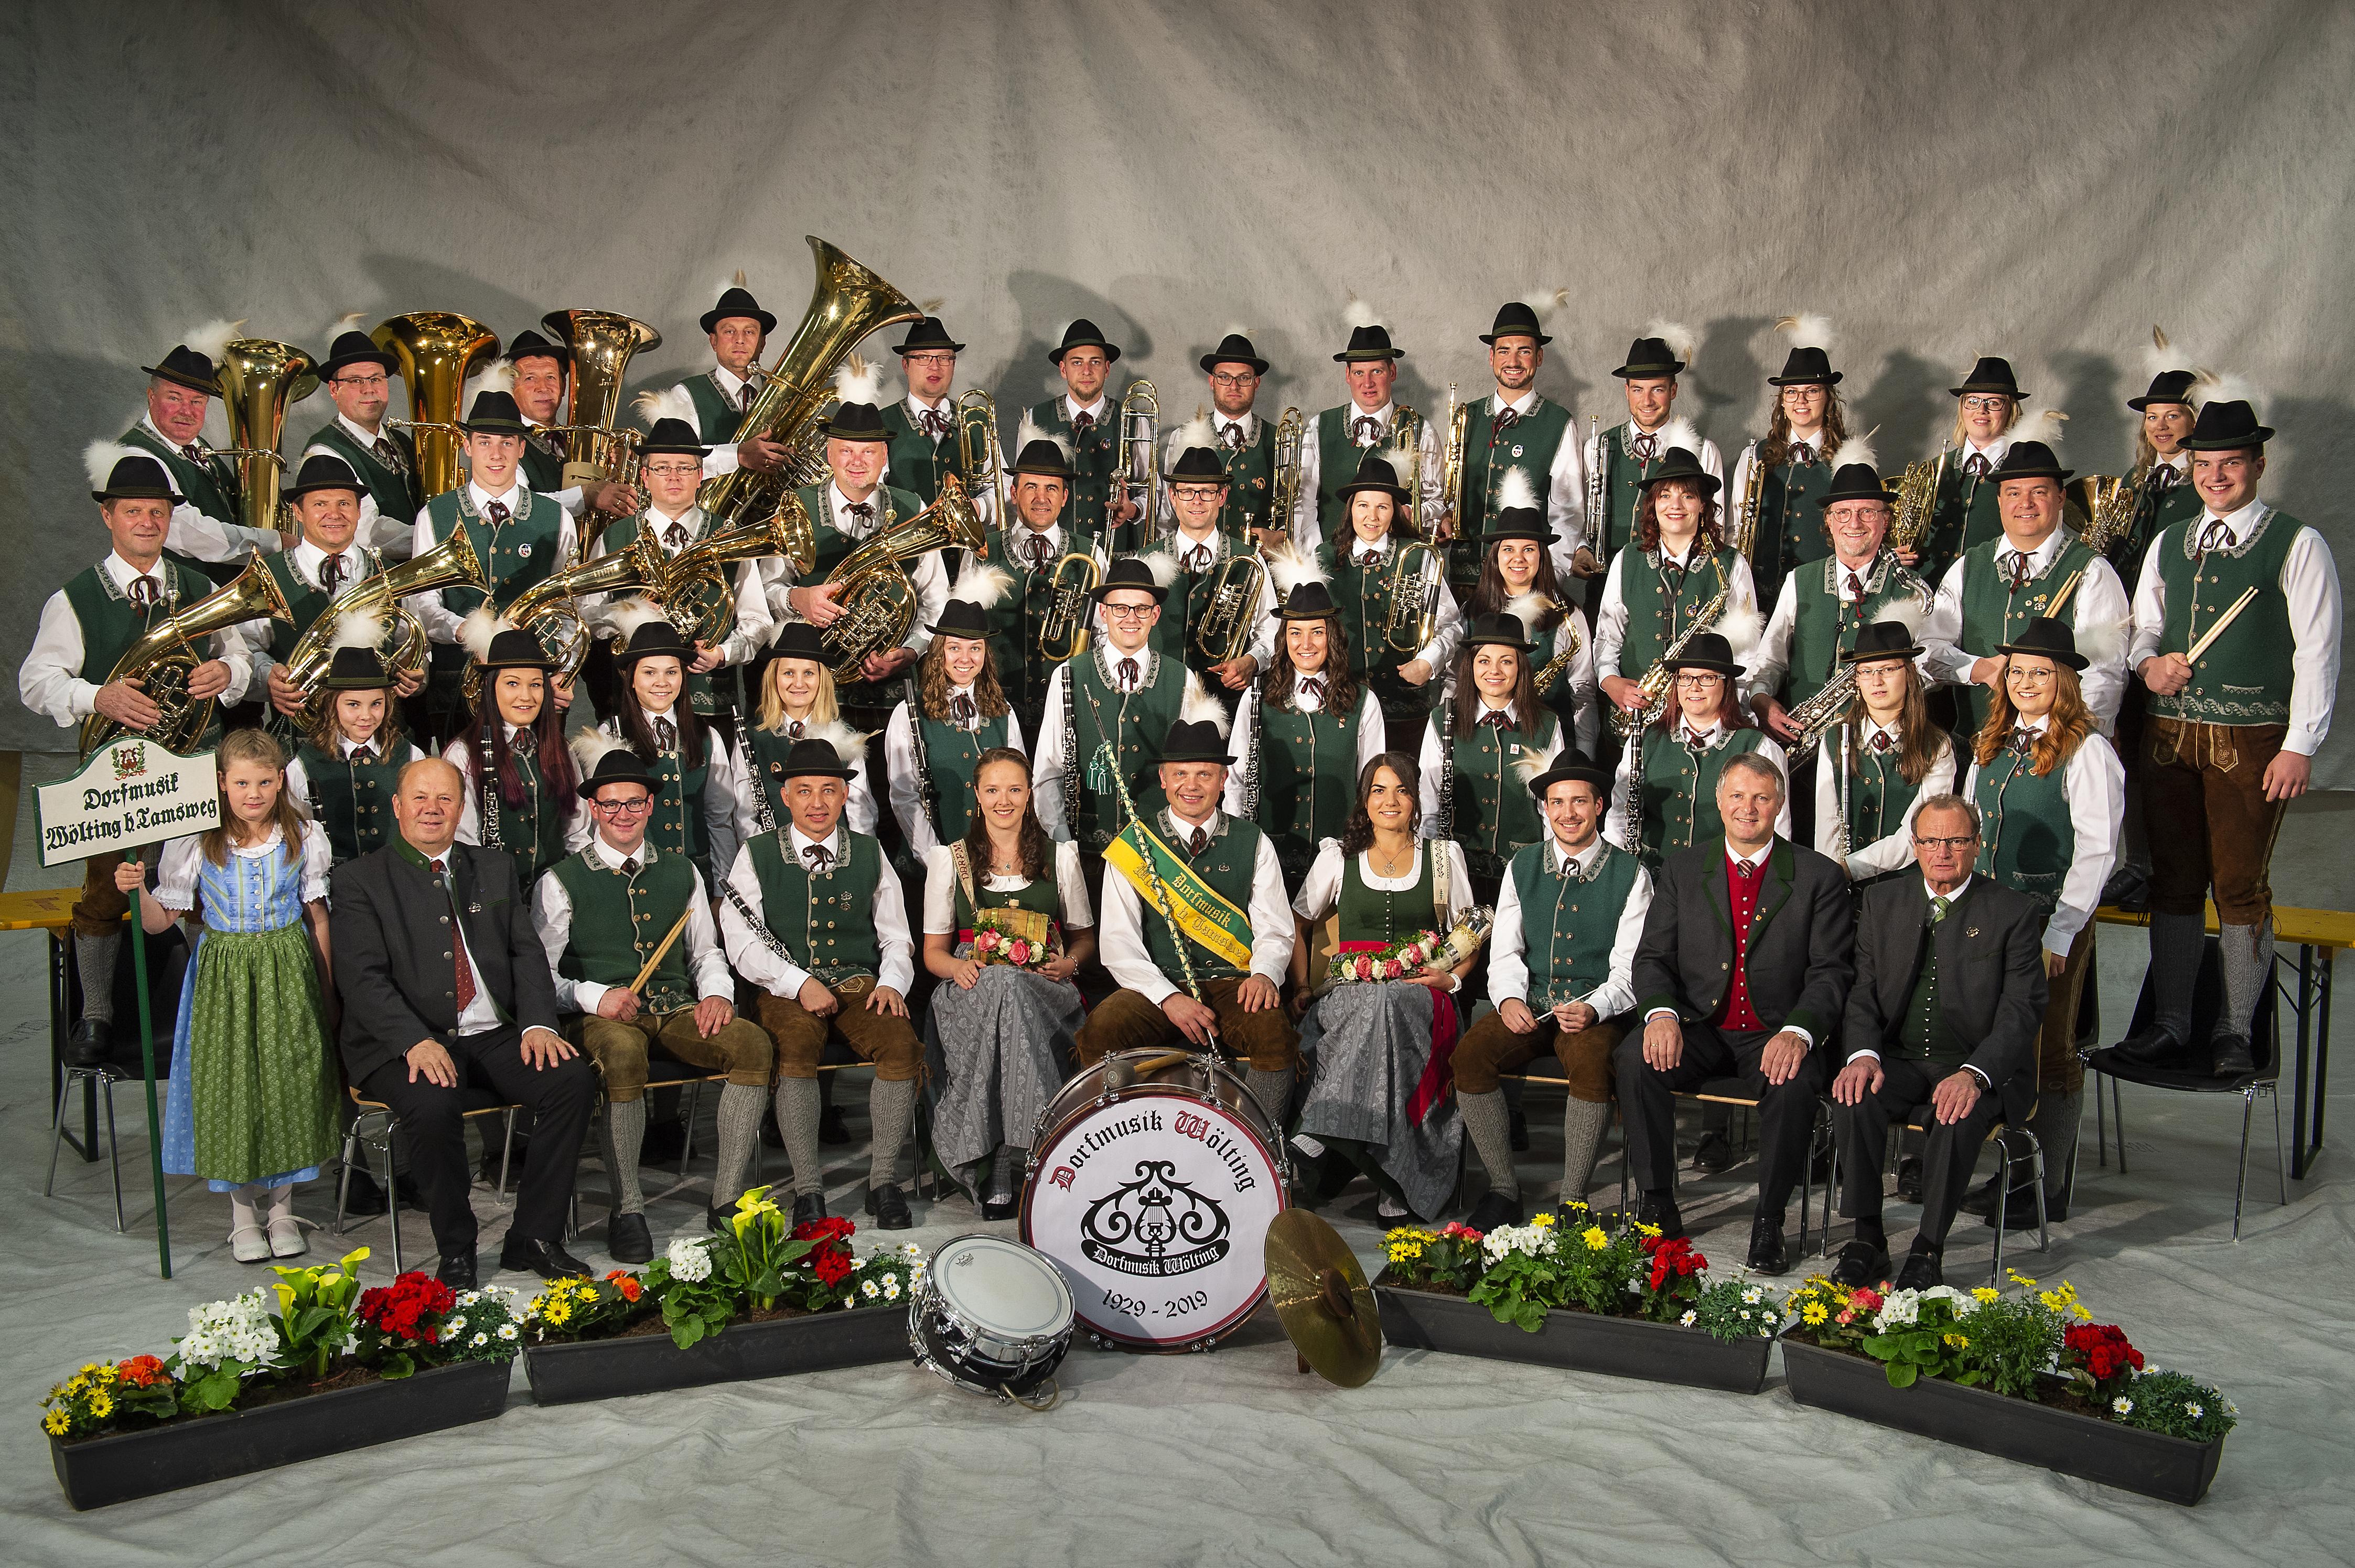 Dorfmusik Wölting Gruppenfoto 2015